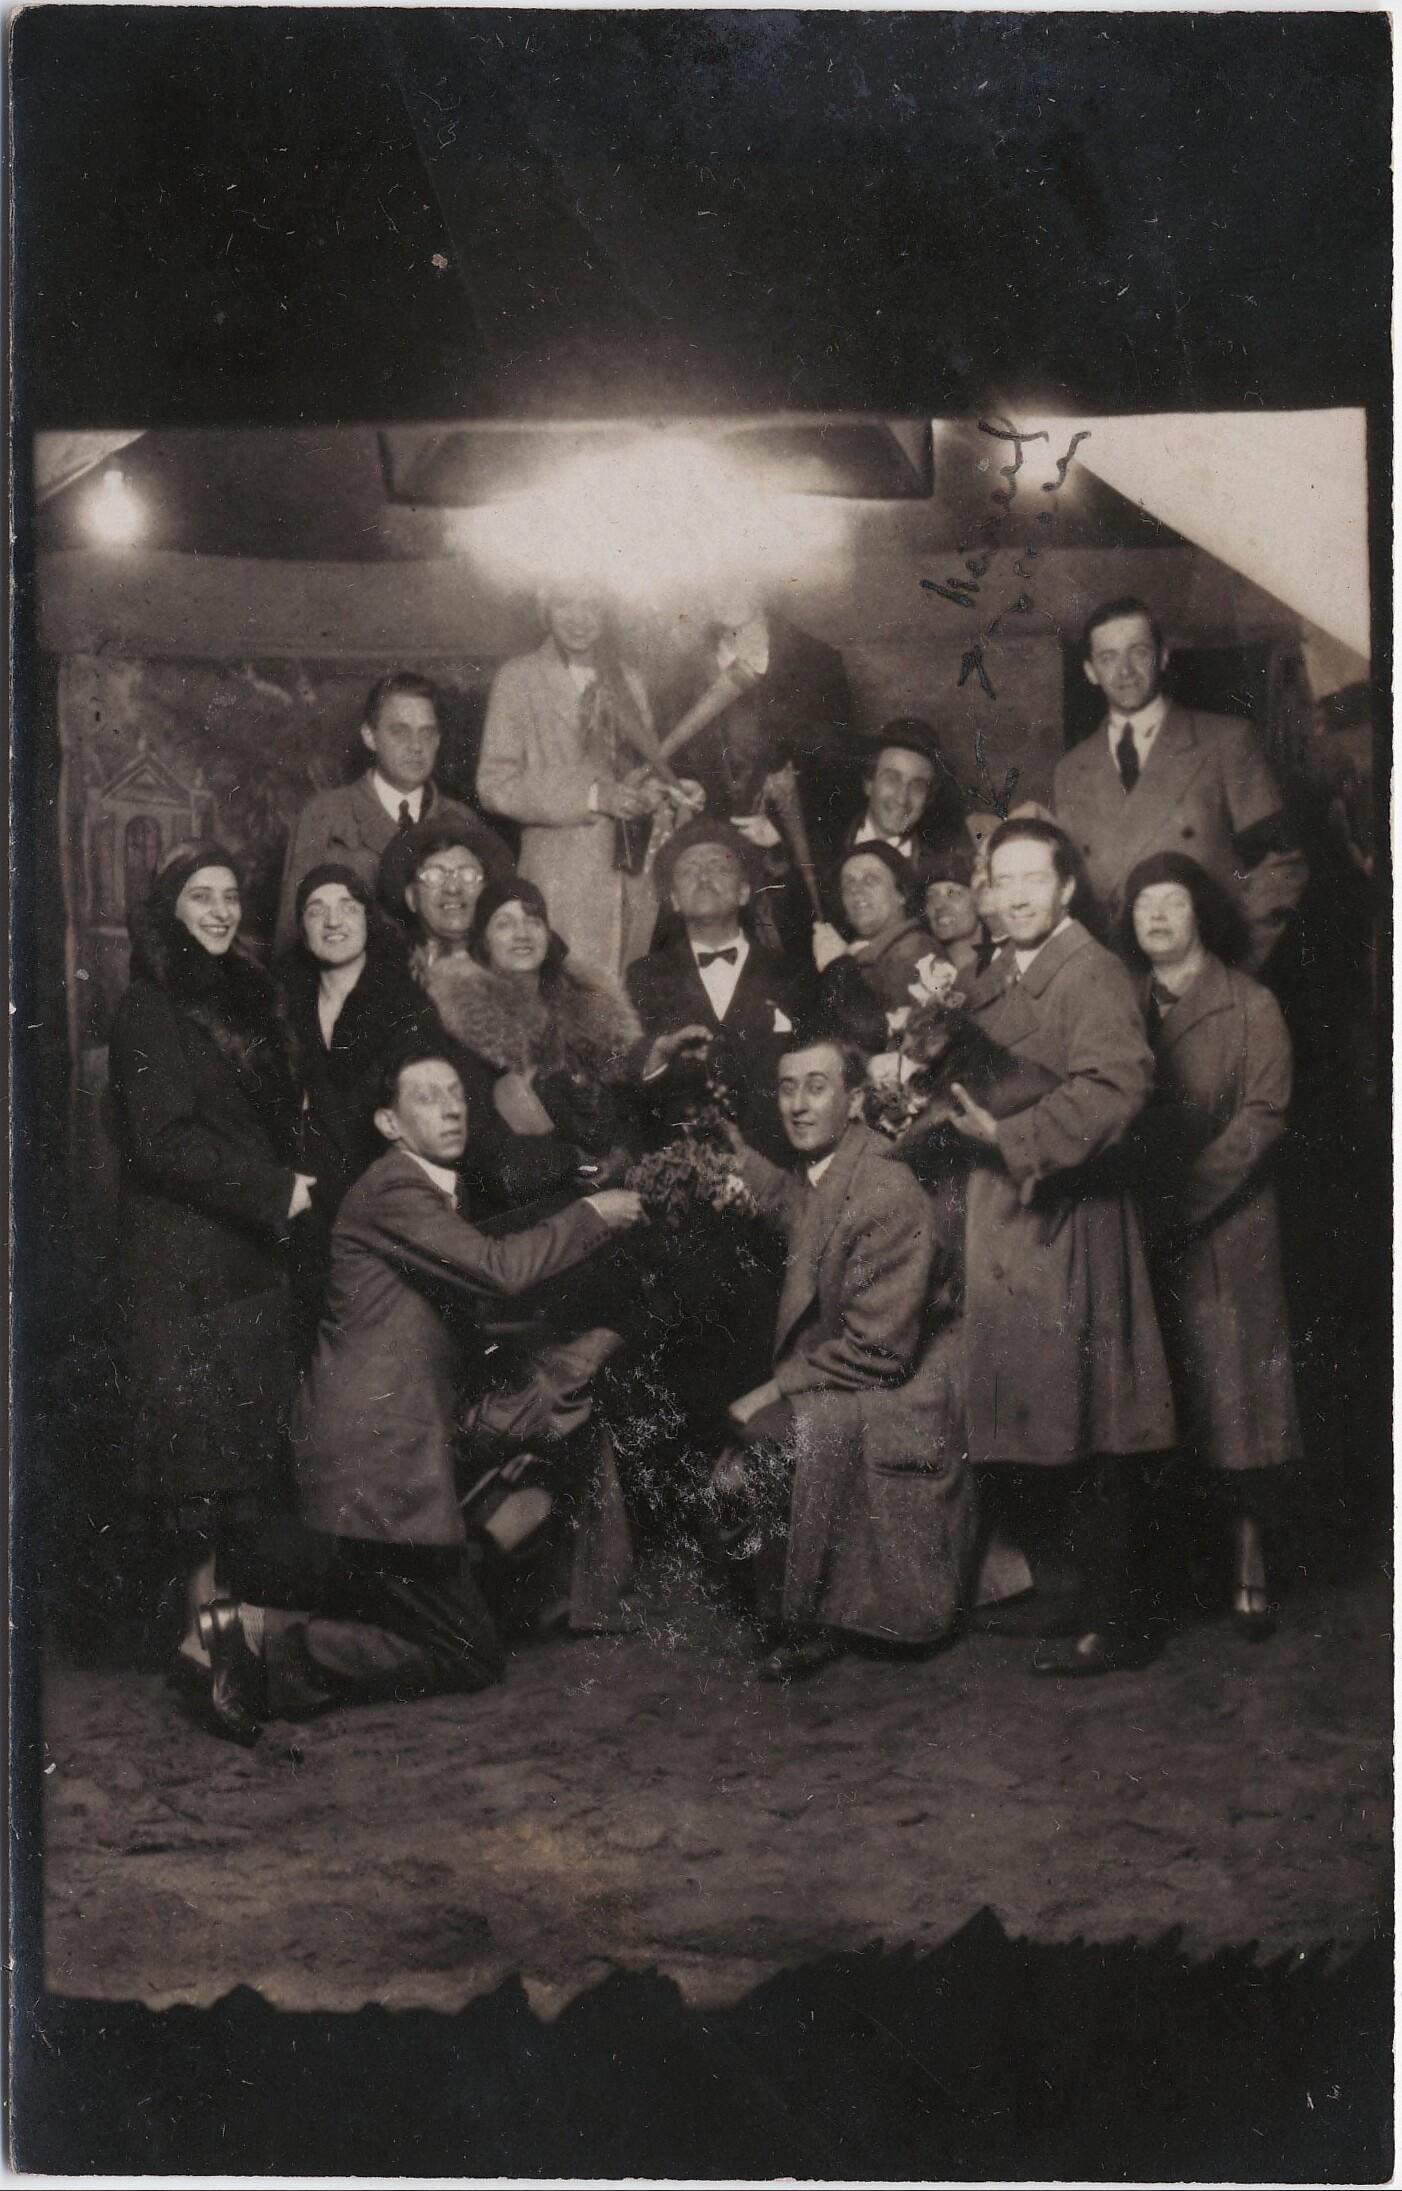 1930. Бухарест, Румыния. Маринетти с «Футуристами Бухареста»